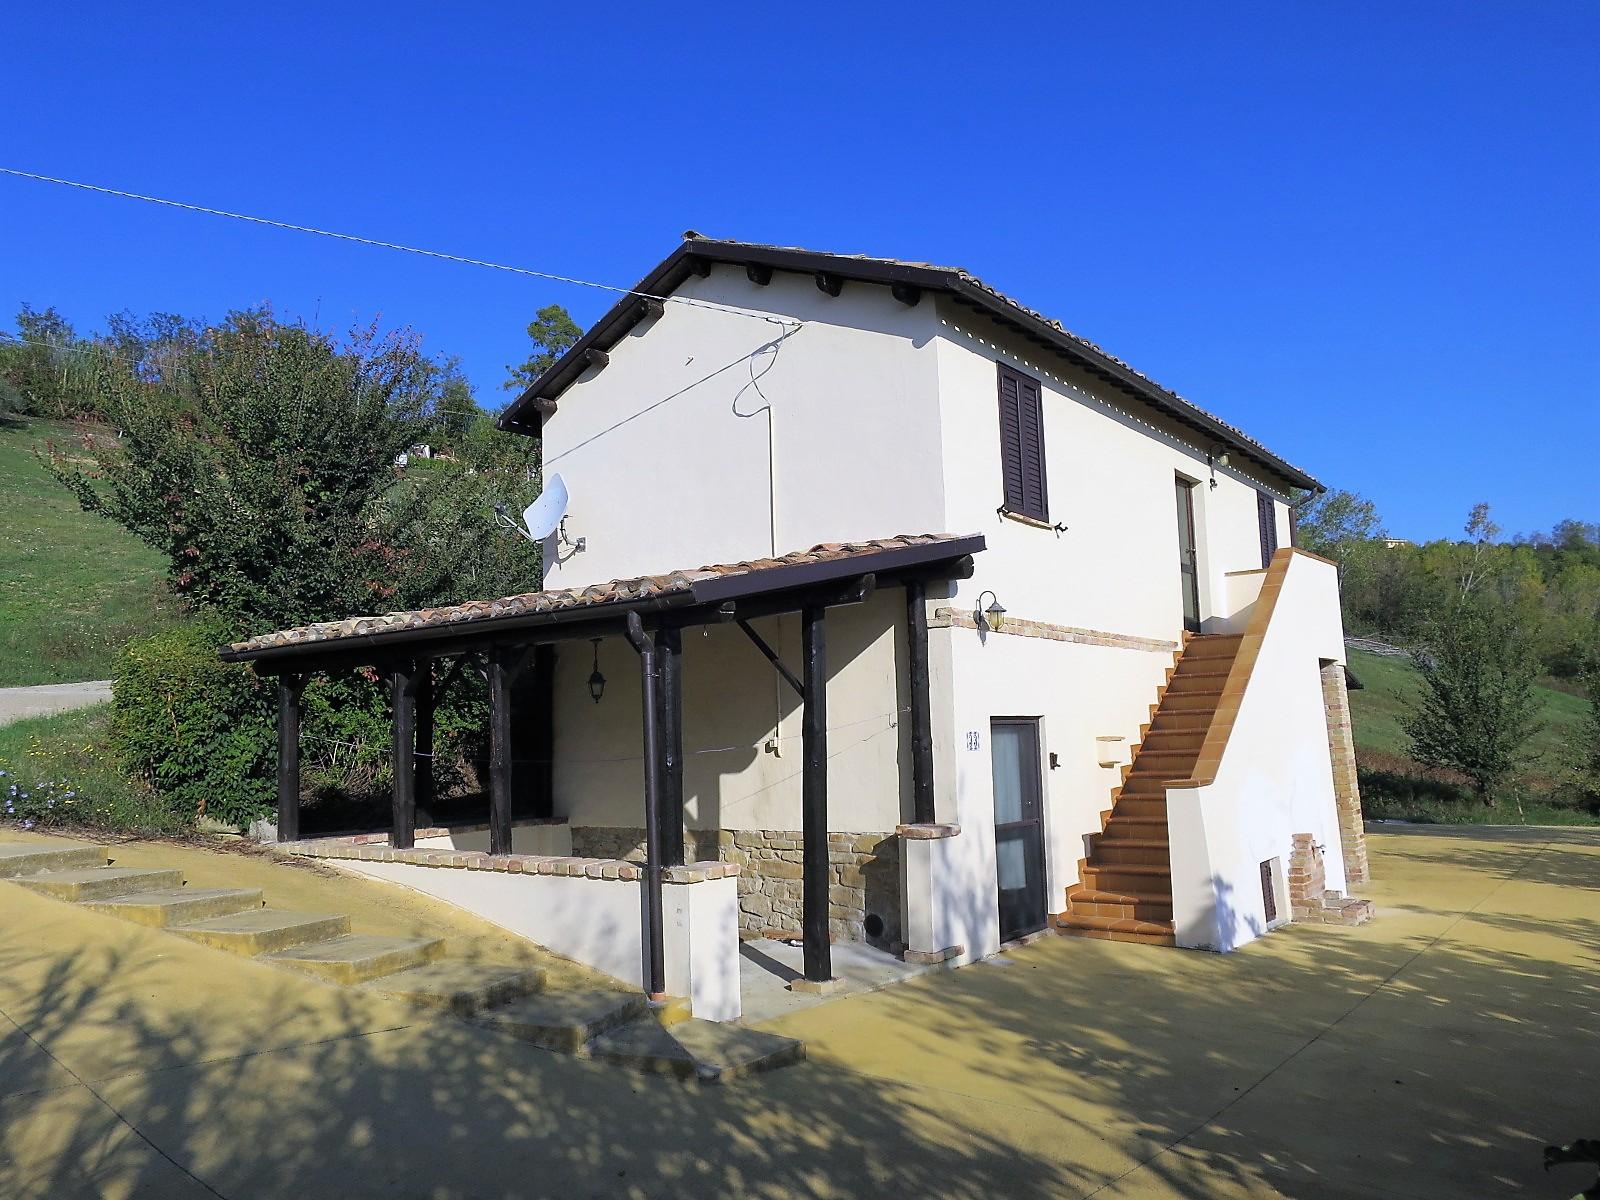 Country Houses Country Houses for sale Montefino (TE), Casa Collina - Montefino - EUR 159.972 10